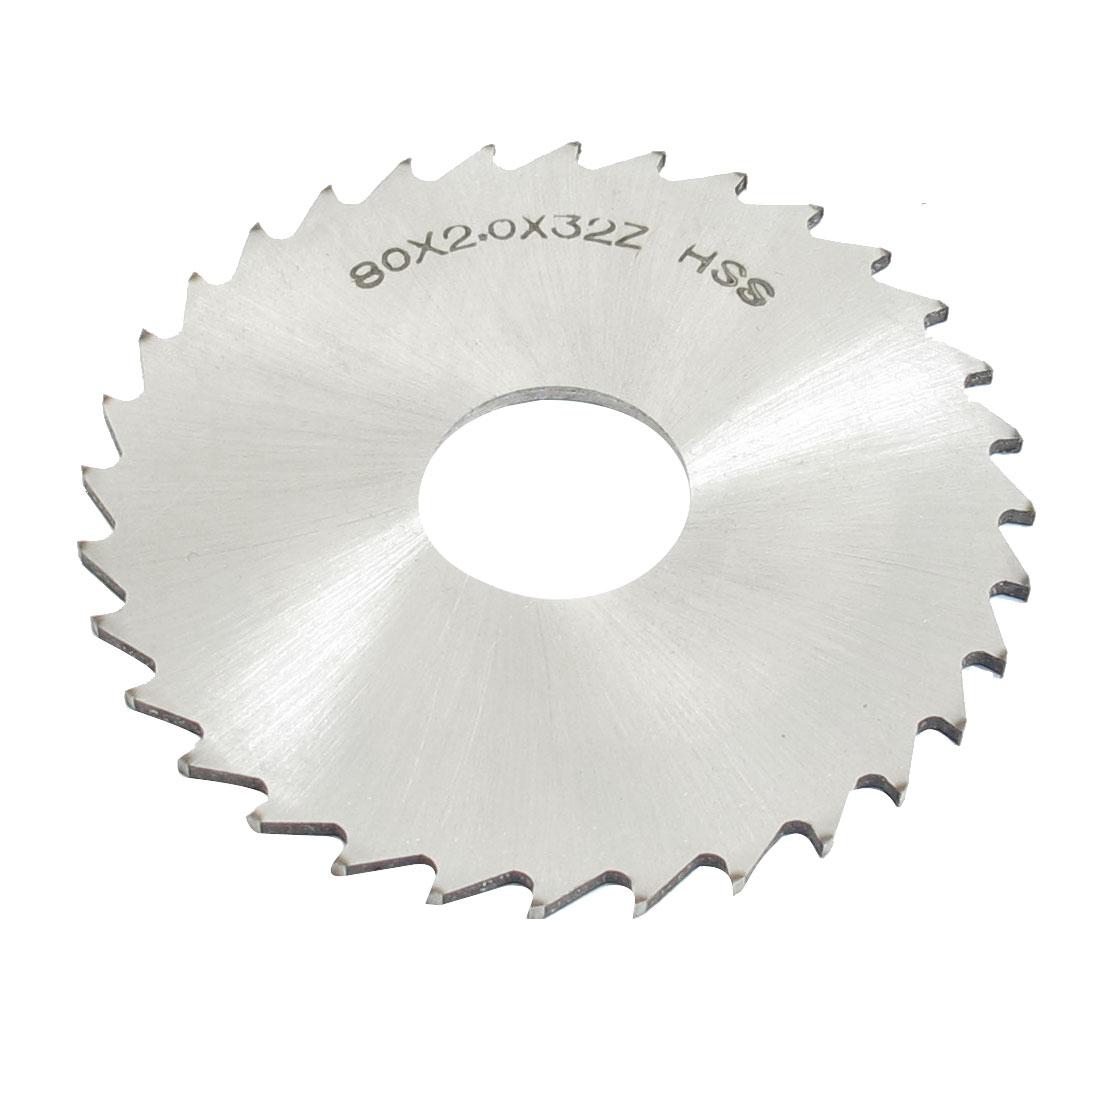 Hand Tool 80mm x 22mm x 2mm 32 Peg Teeth HSS Slitting Saw